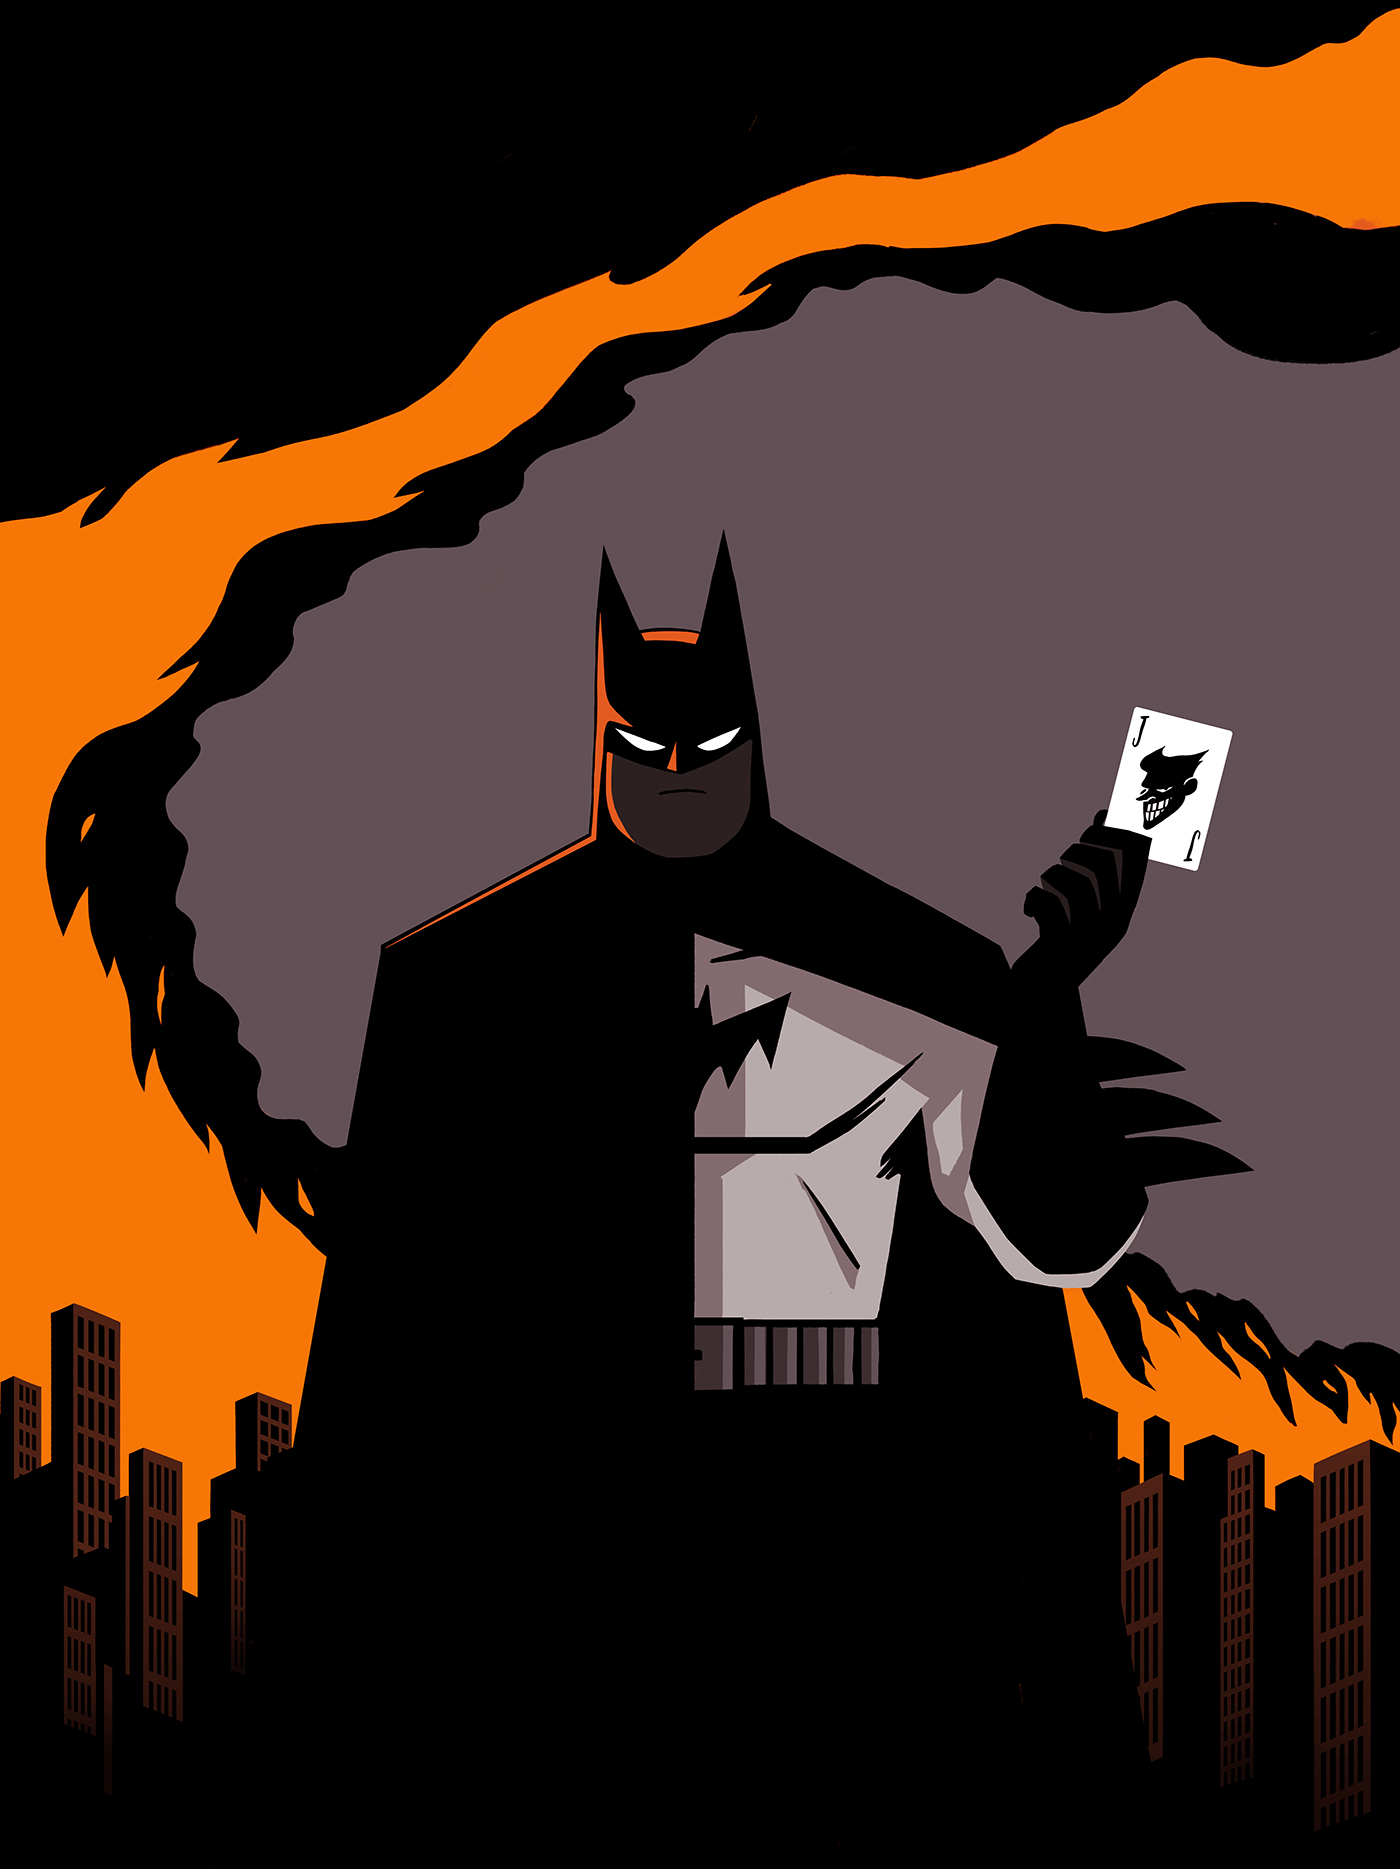 batman joker Bruce Wayne two faces animated serie poster affiche orange dark